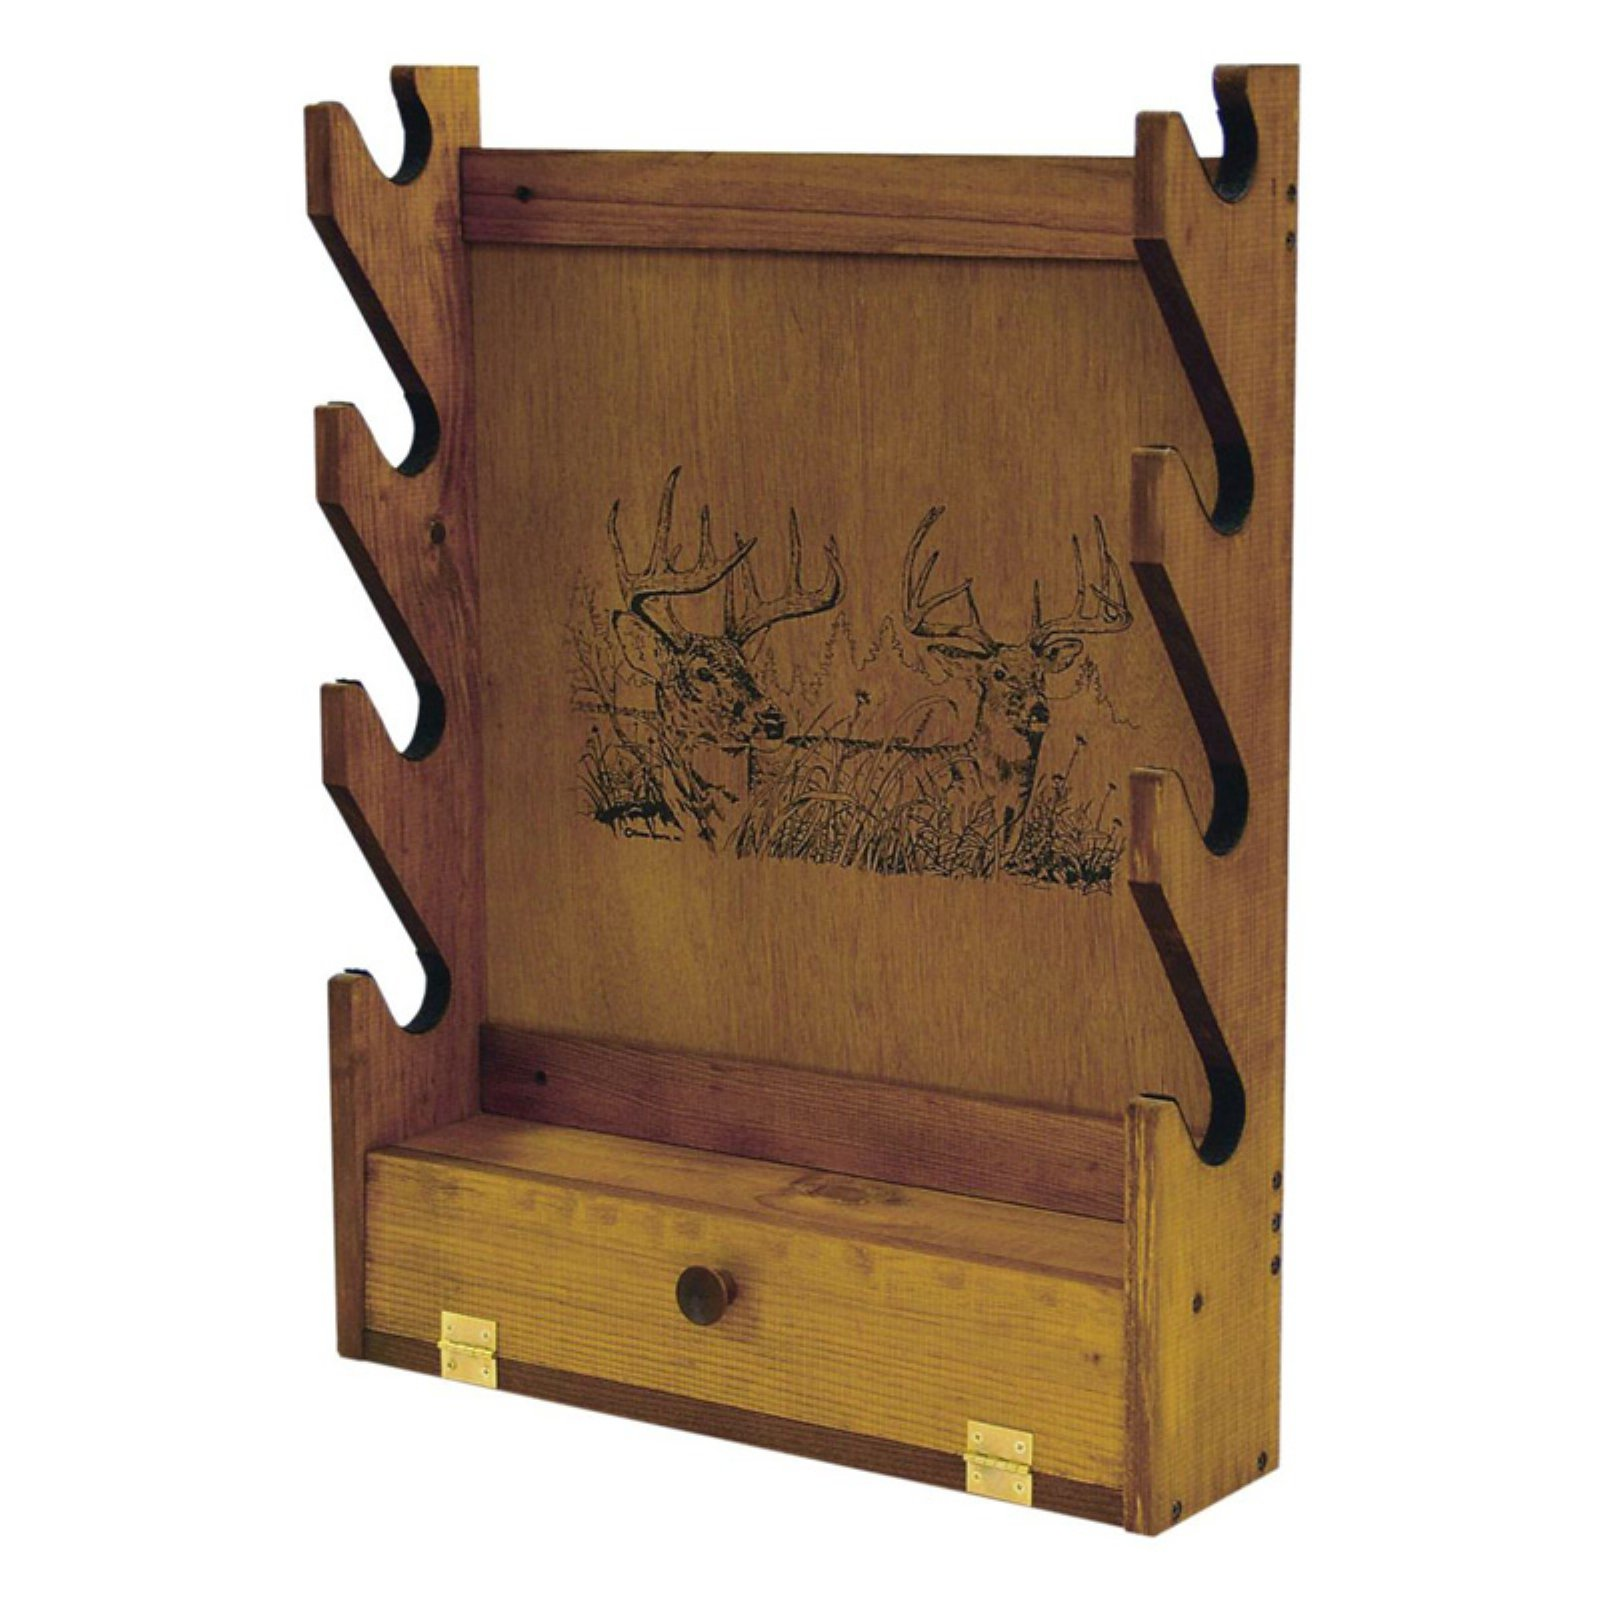 Evans Sports 4/Gun Wooden Rack-Two Trophy Deer Print